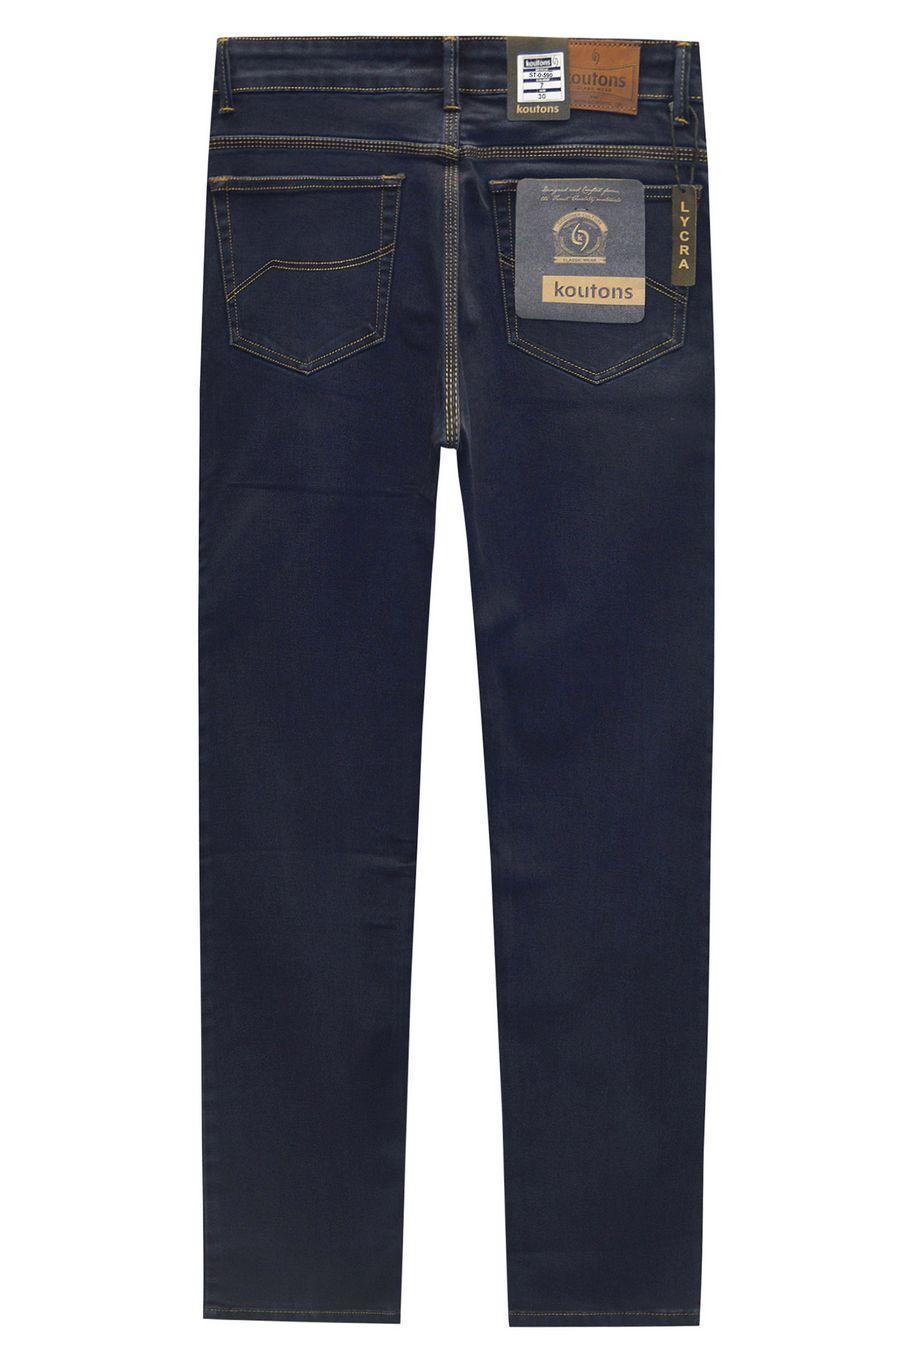 Джинсы мужские Koutons ST-0-590-7 Stretch Black-Blue (30-38) - фото 2